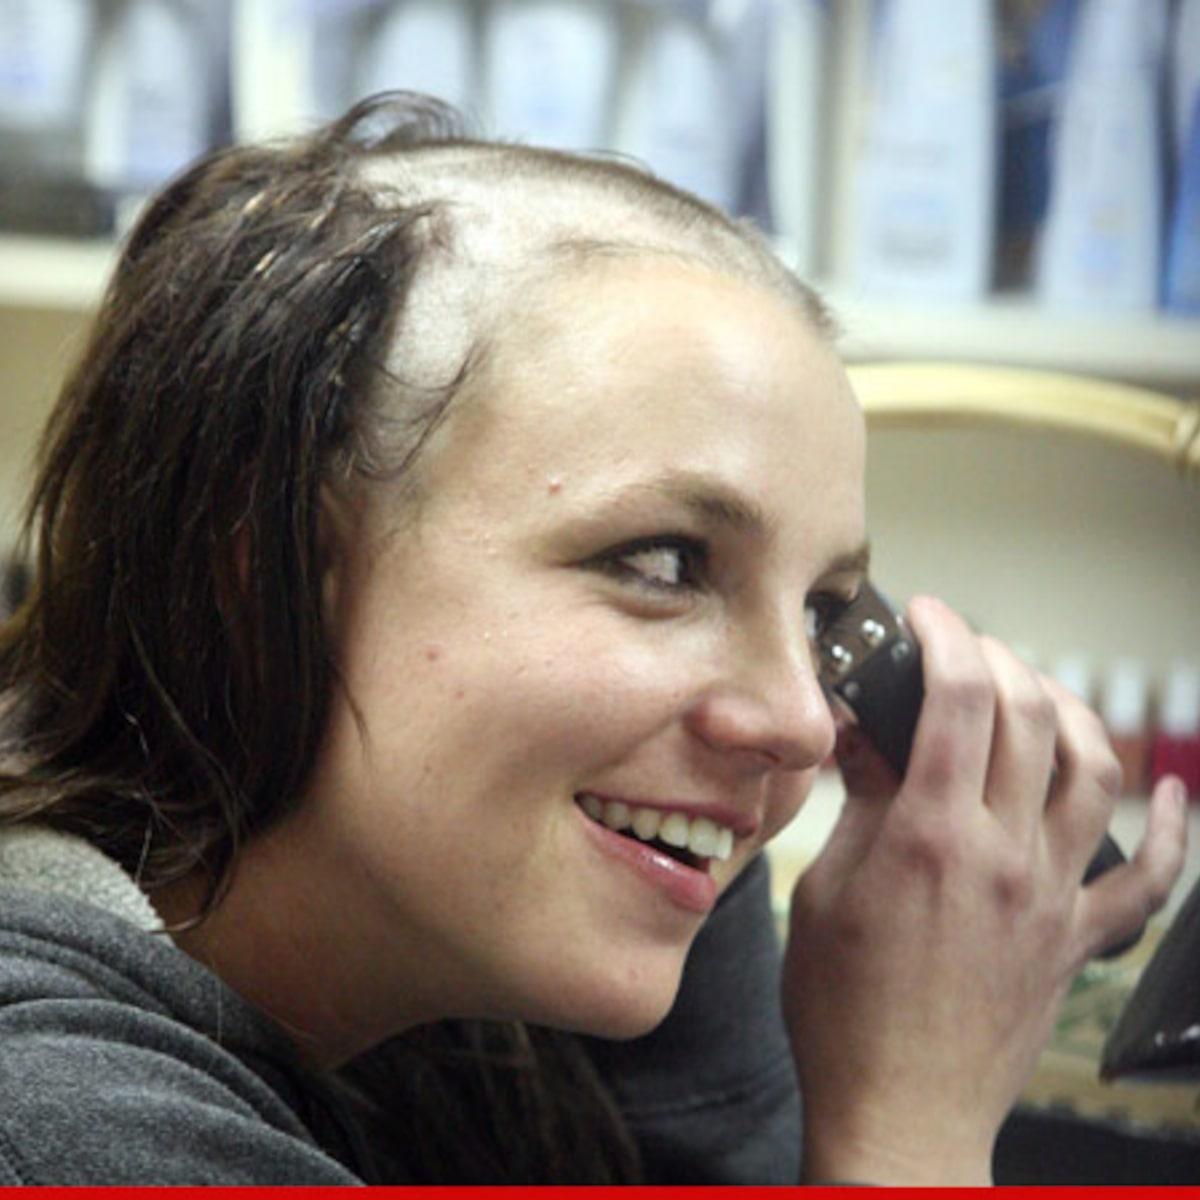 Britney shaving her head.